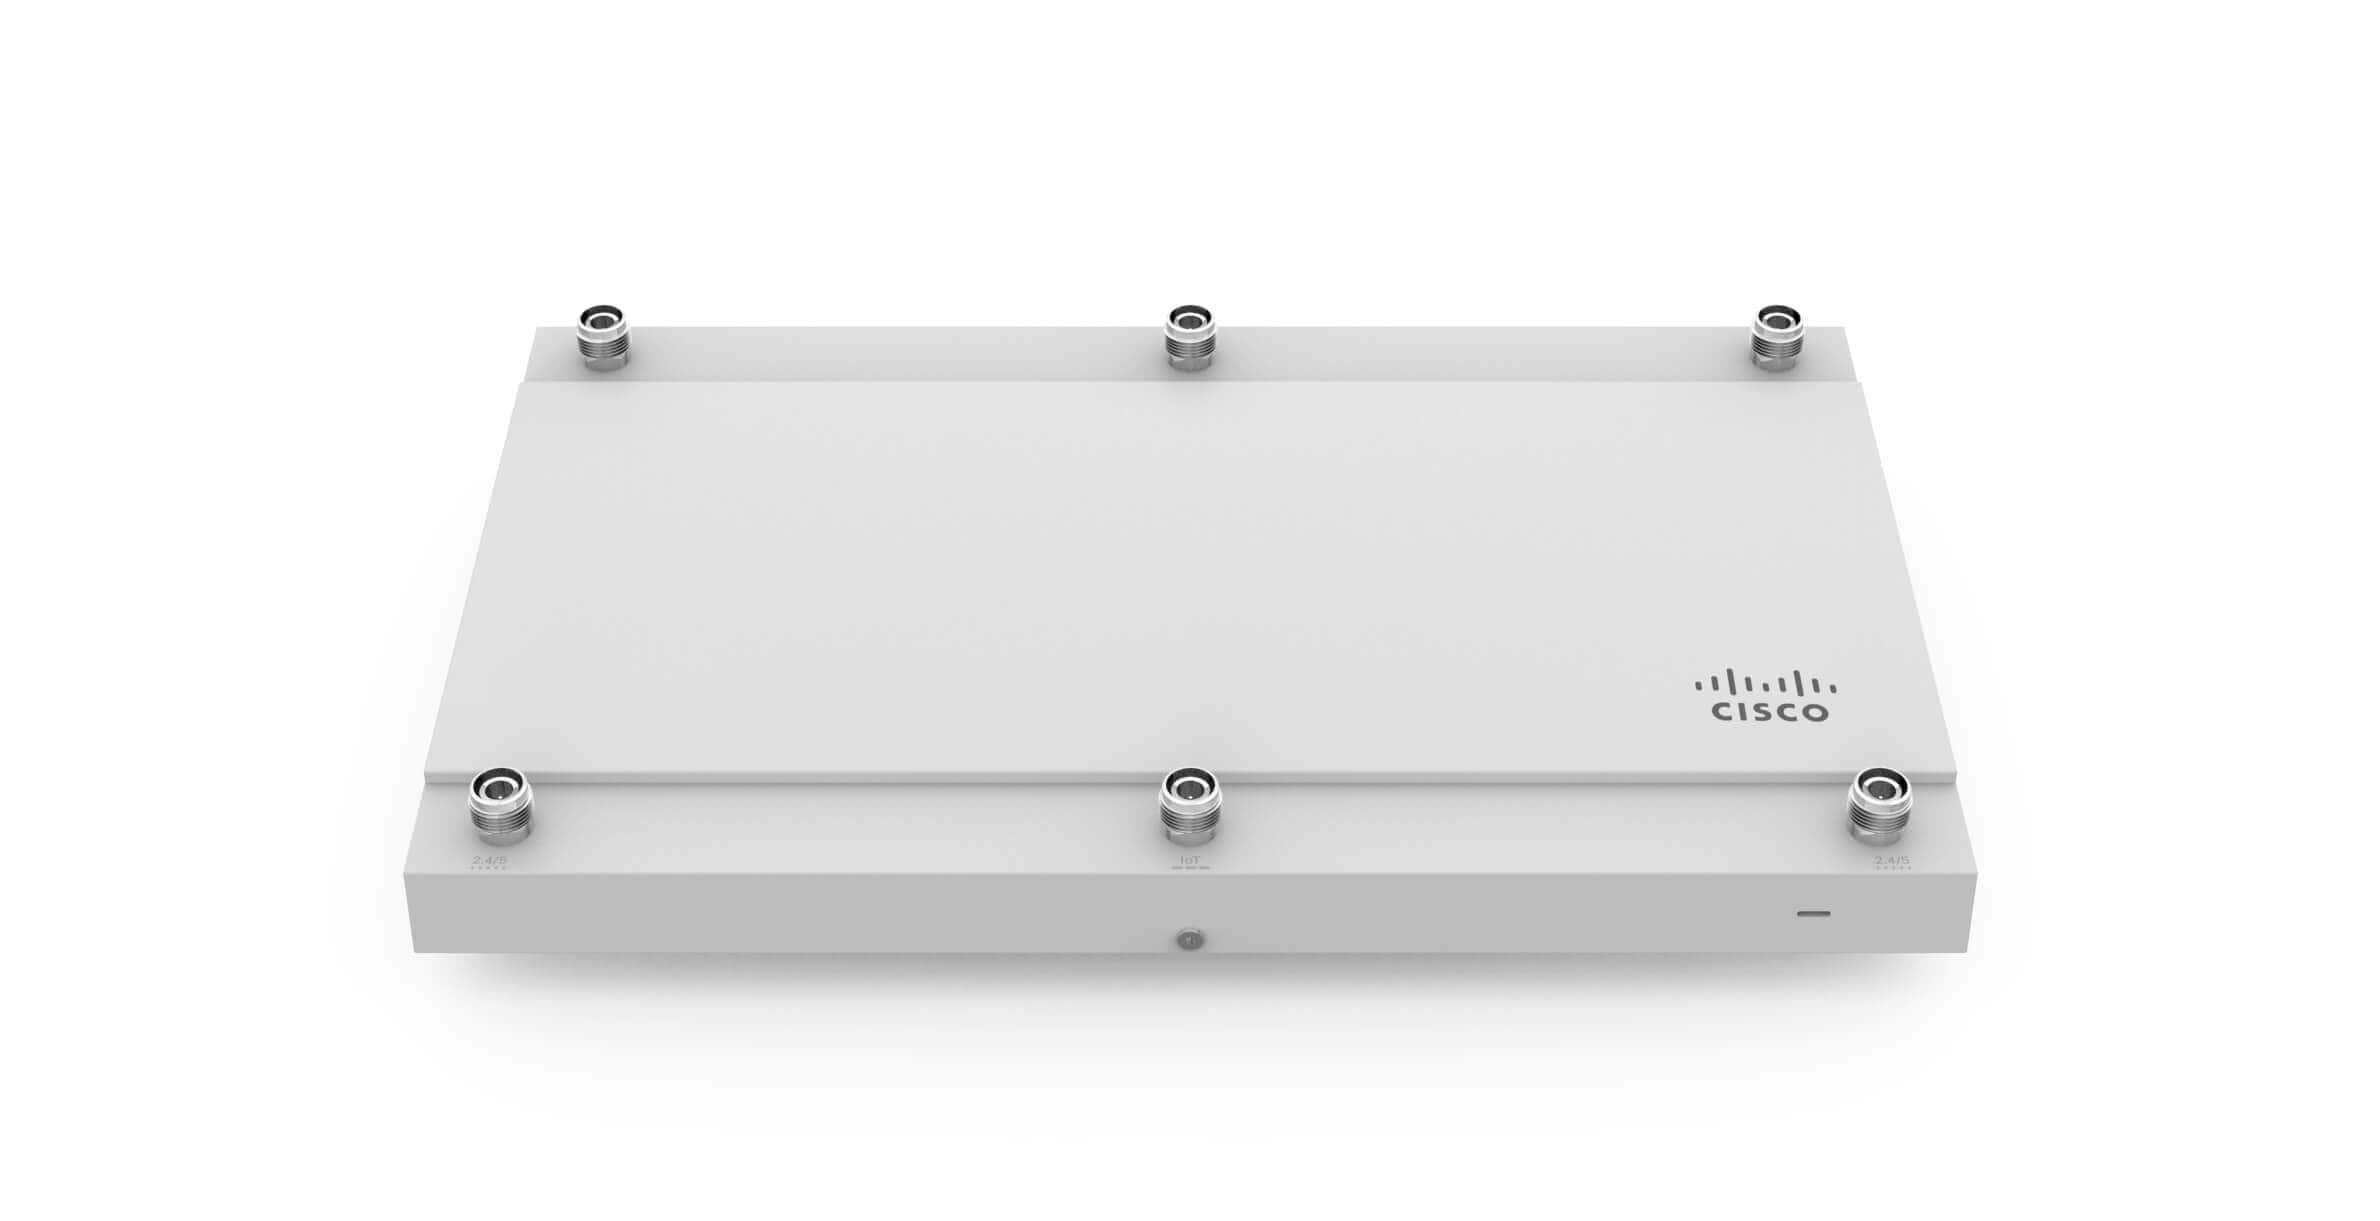 Cisco Meraki MR53 - WiFI - WiFi 6 Indoor Access Point